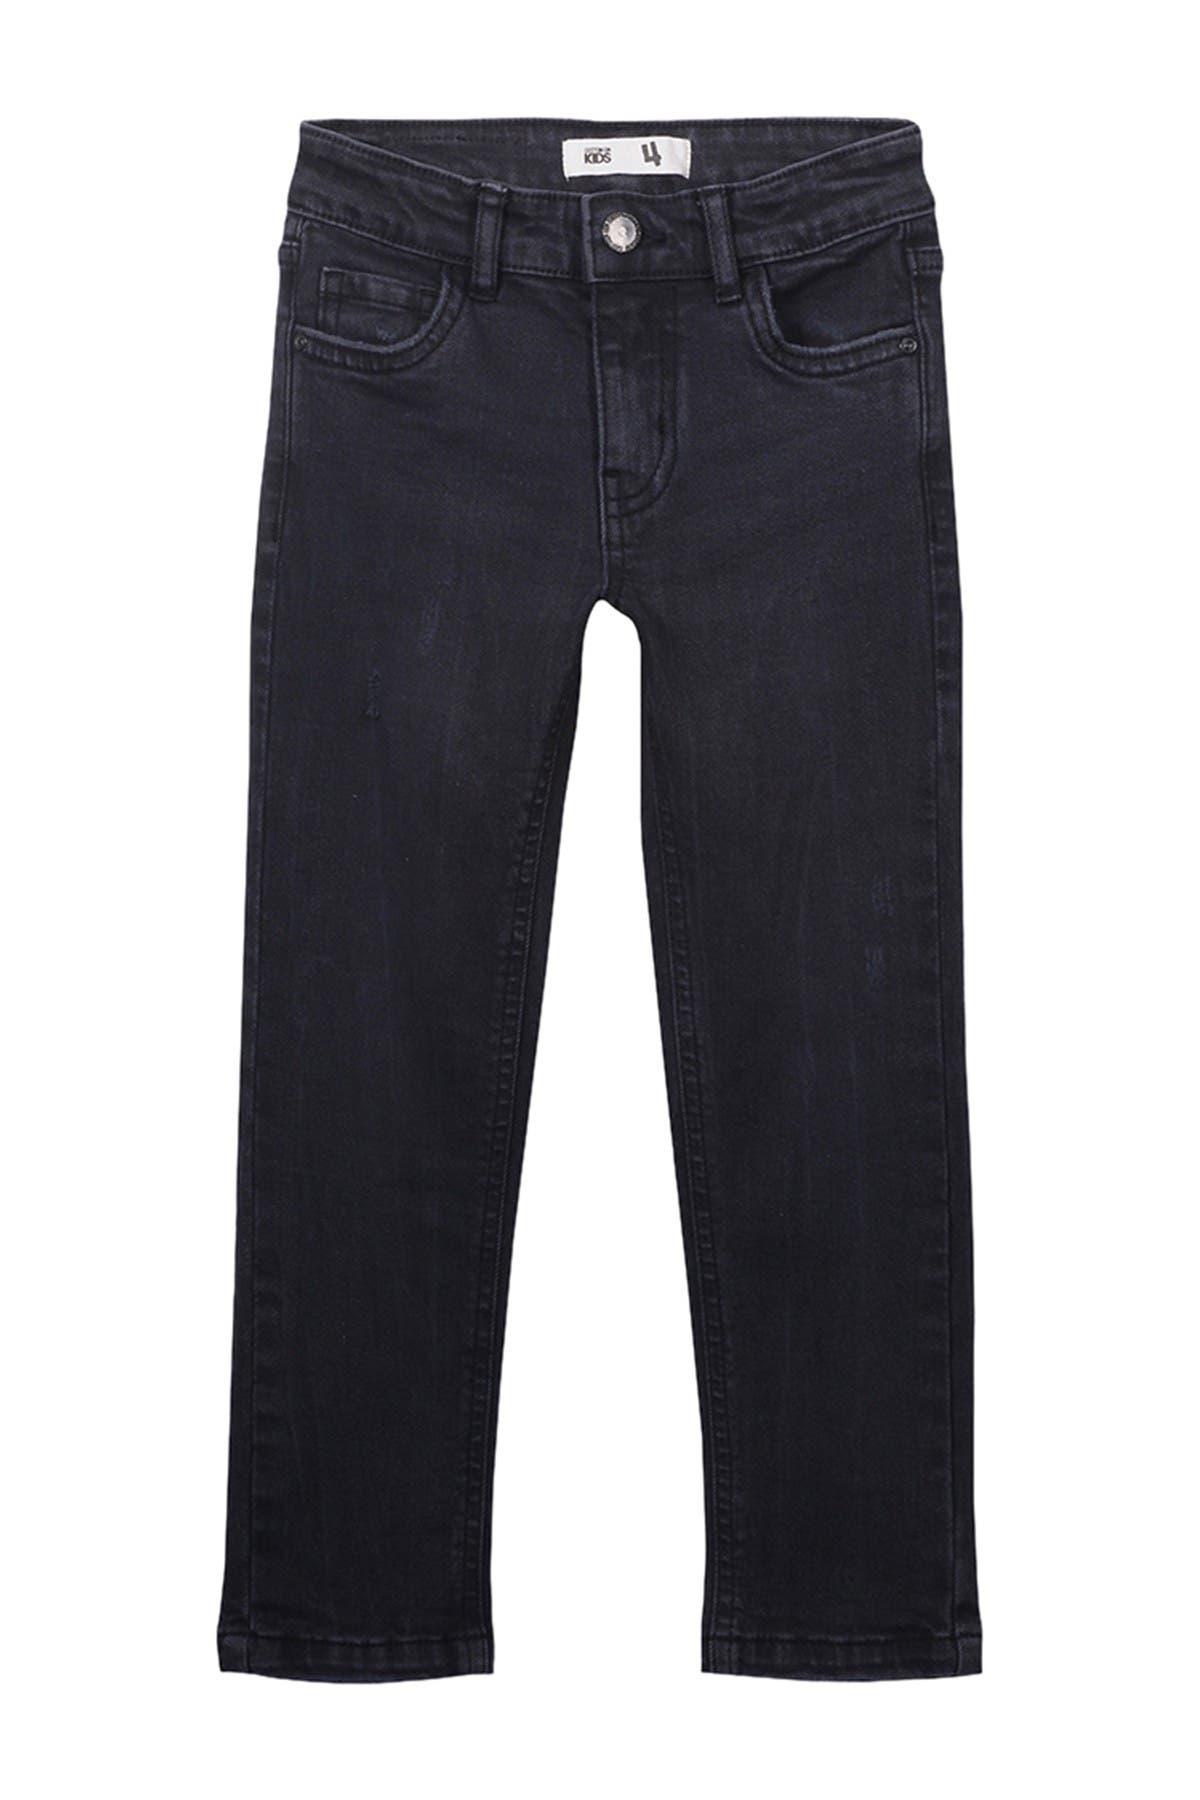 Cotton On Ollie Slim Leg Jeans at Nordstrom Rack